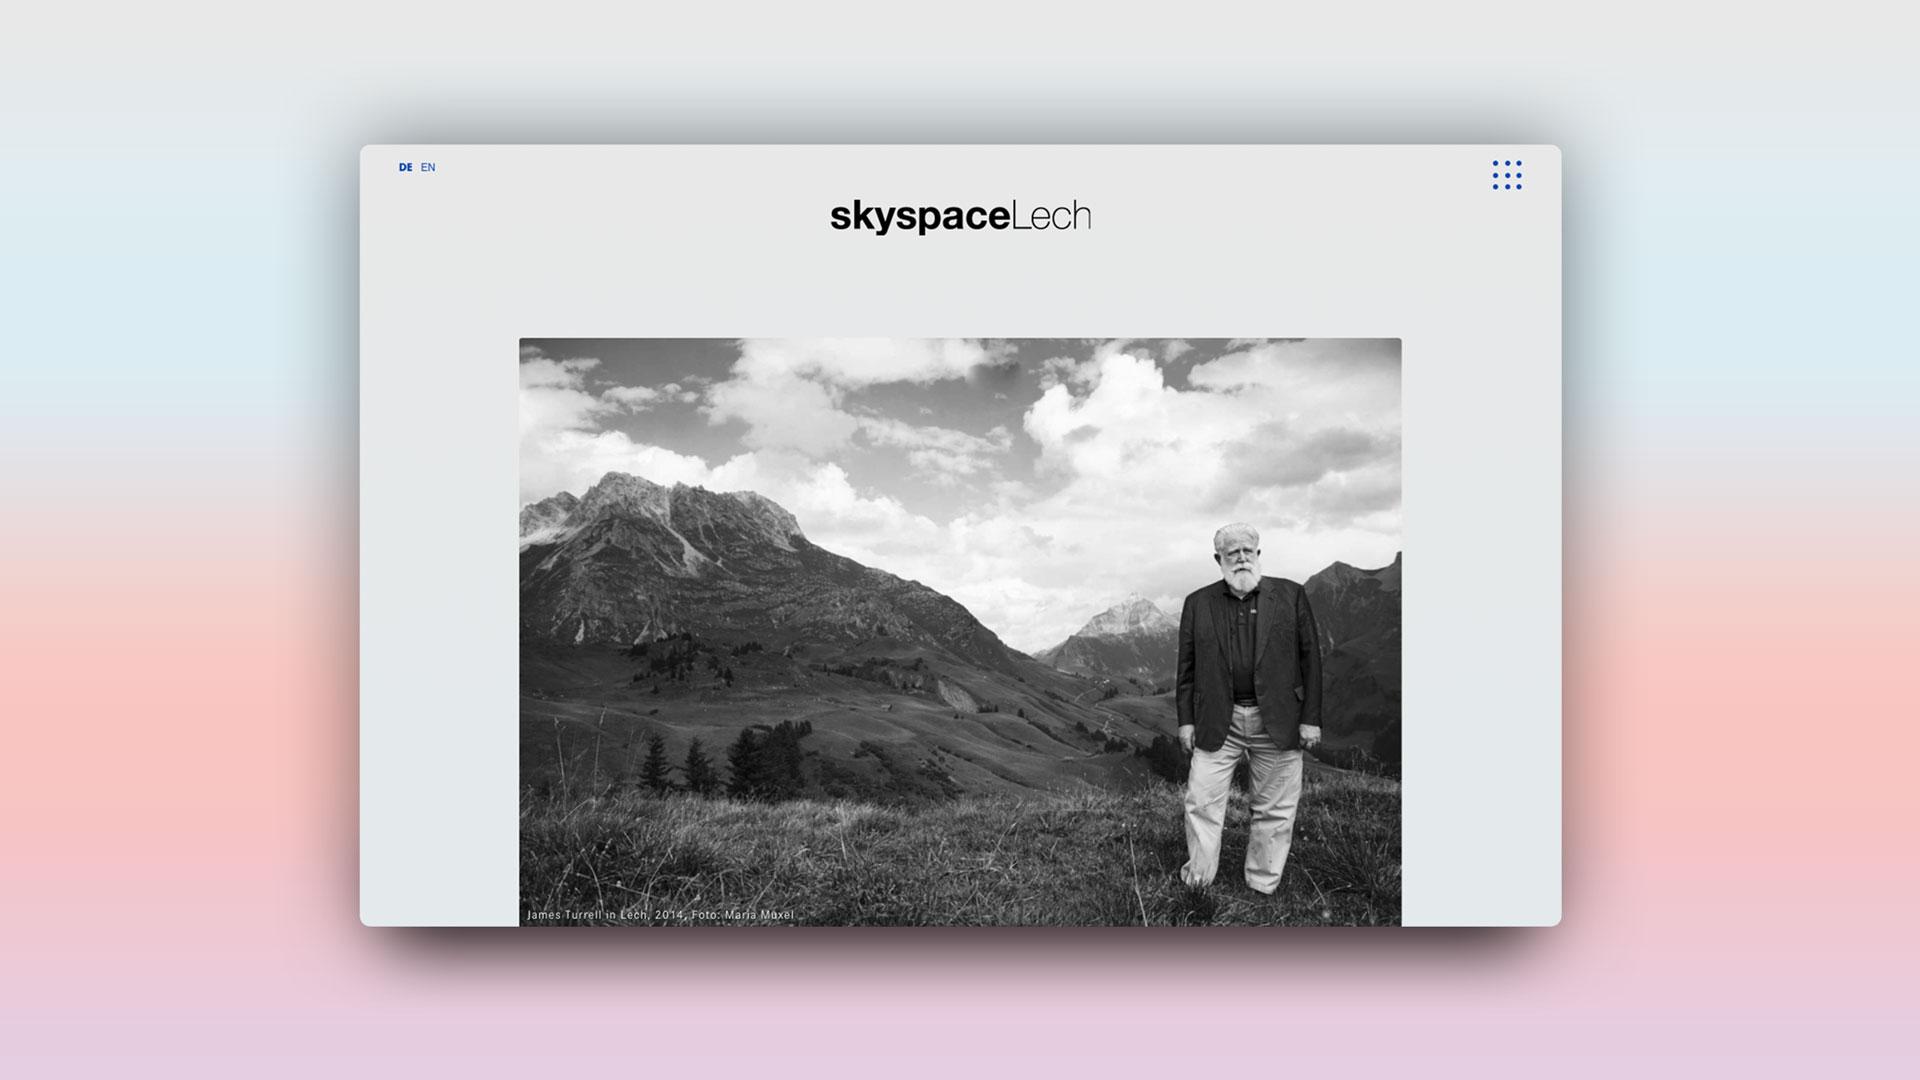 skyspace Lech